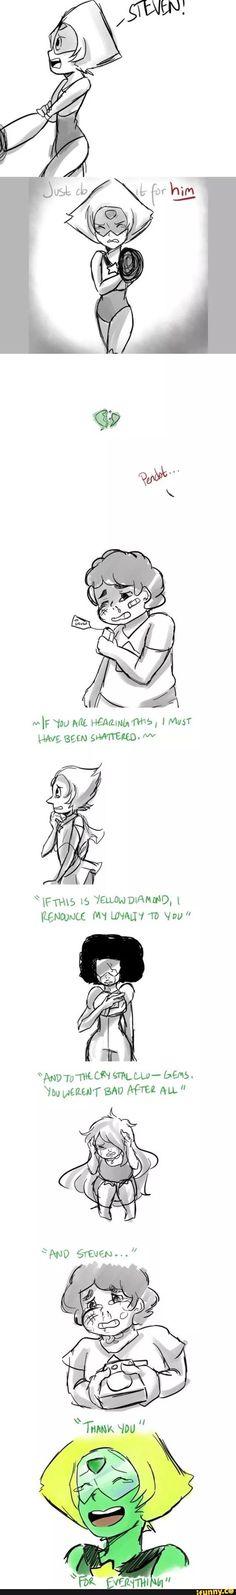 true, tumblr, stevenuniverse, sad, peridot: